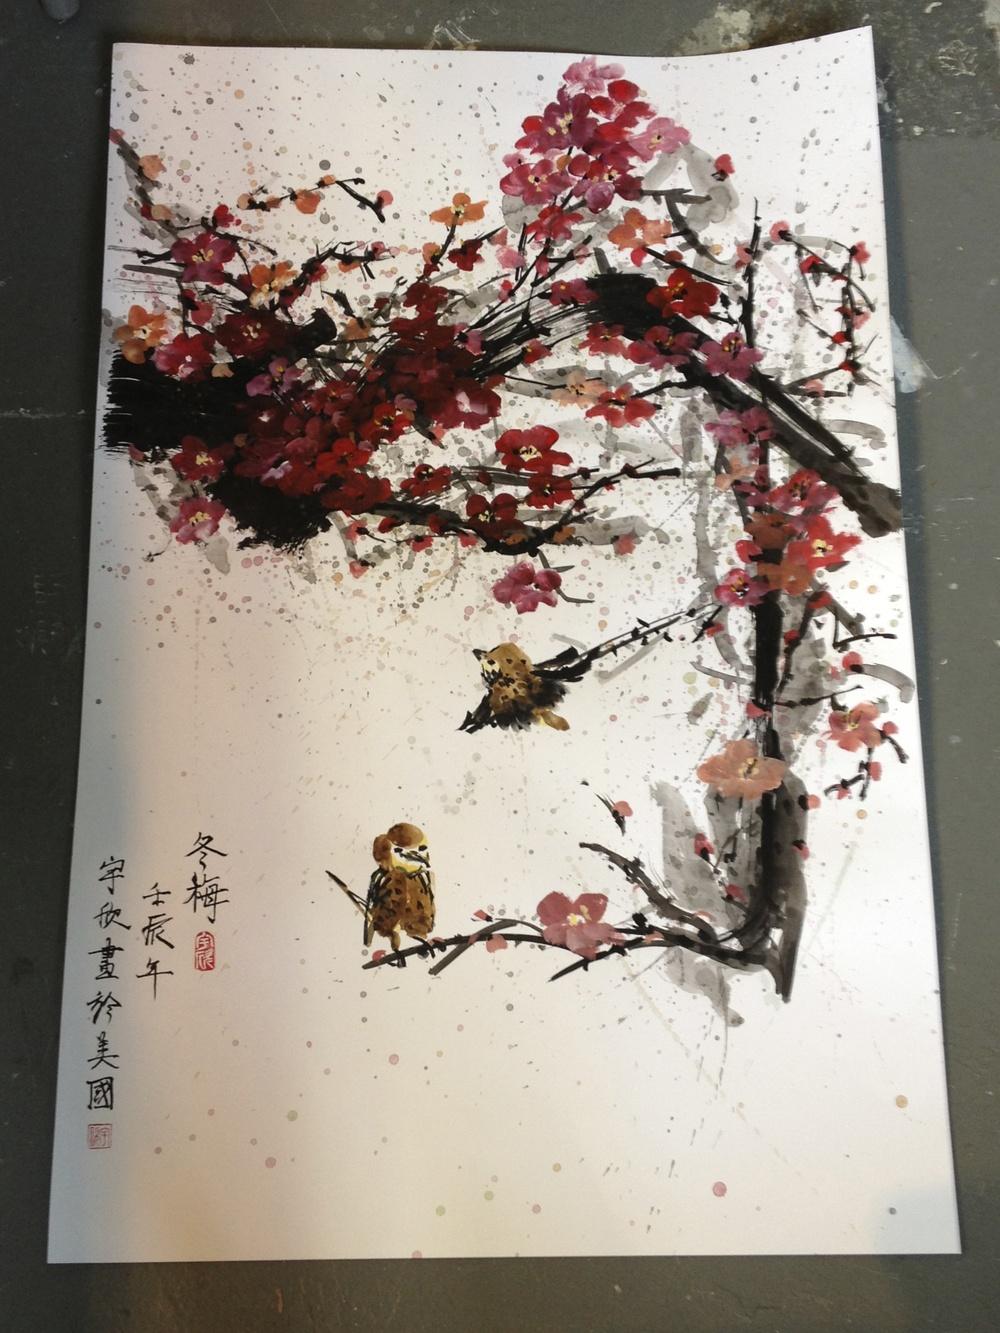 yenny_chinese_painting1.jpg